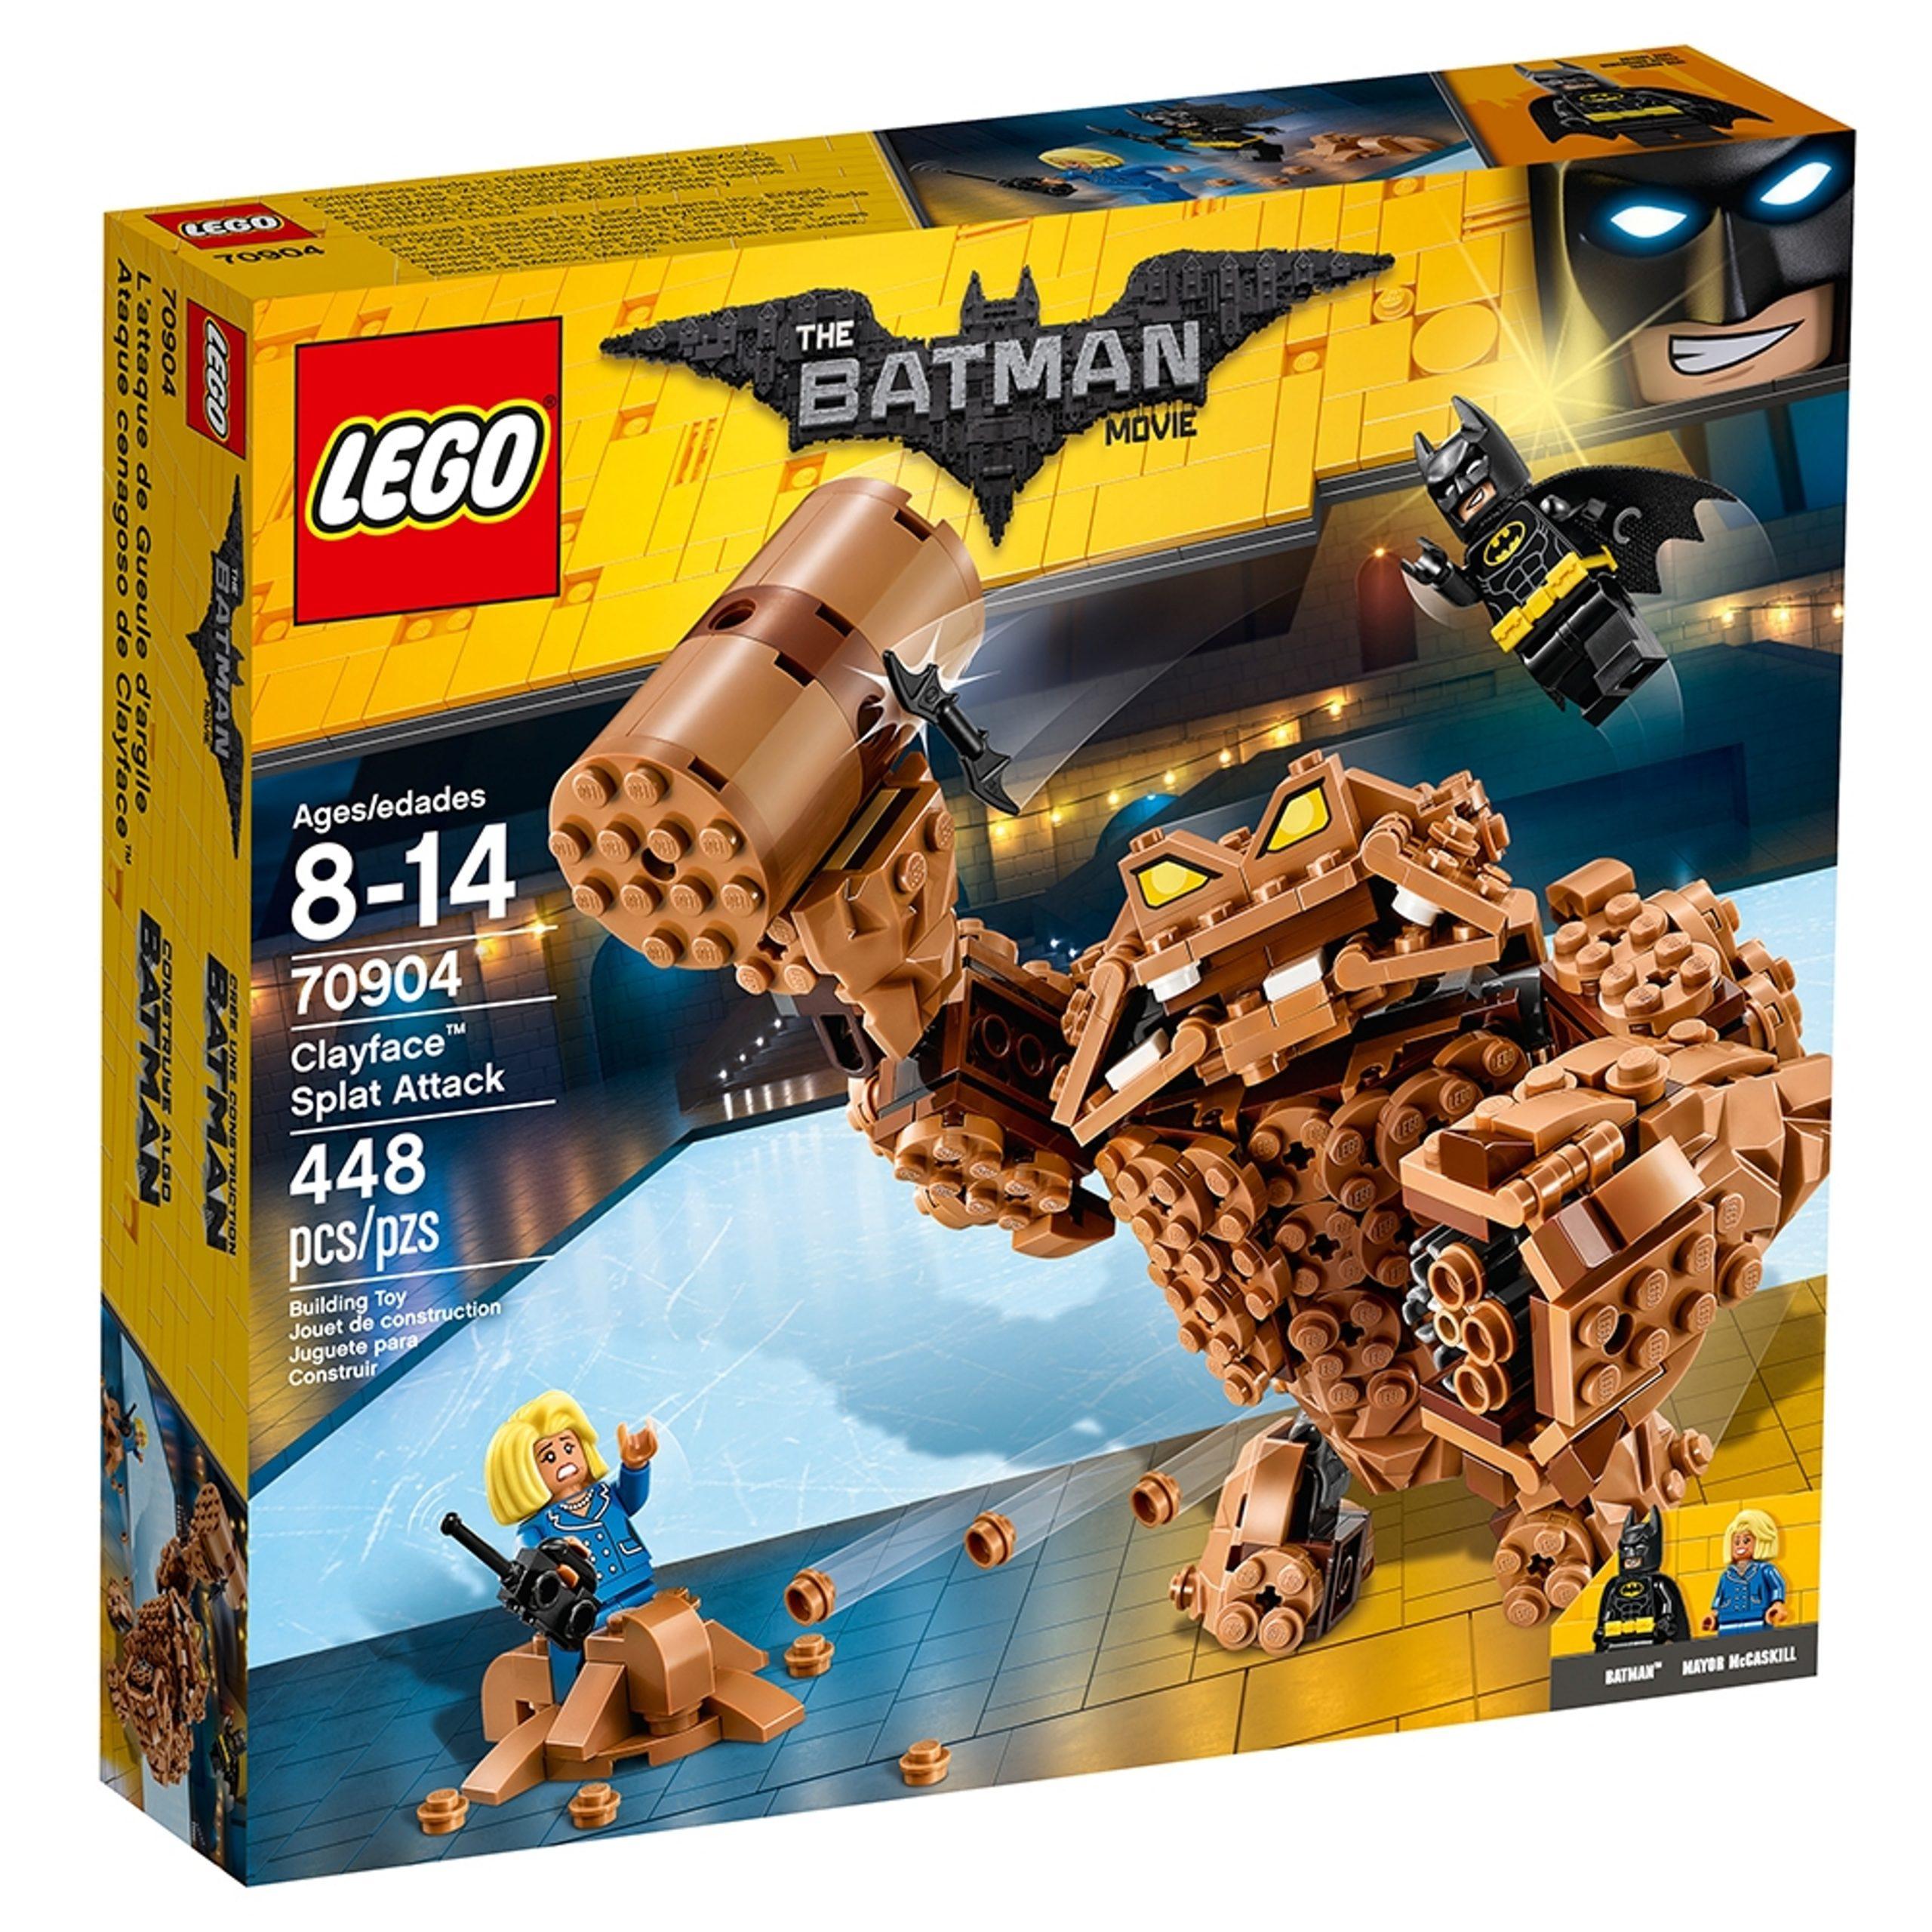 lego 70904 clayface matsch attacke scaled